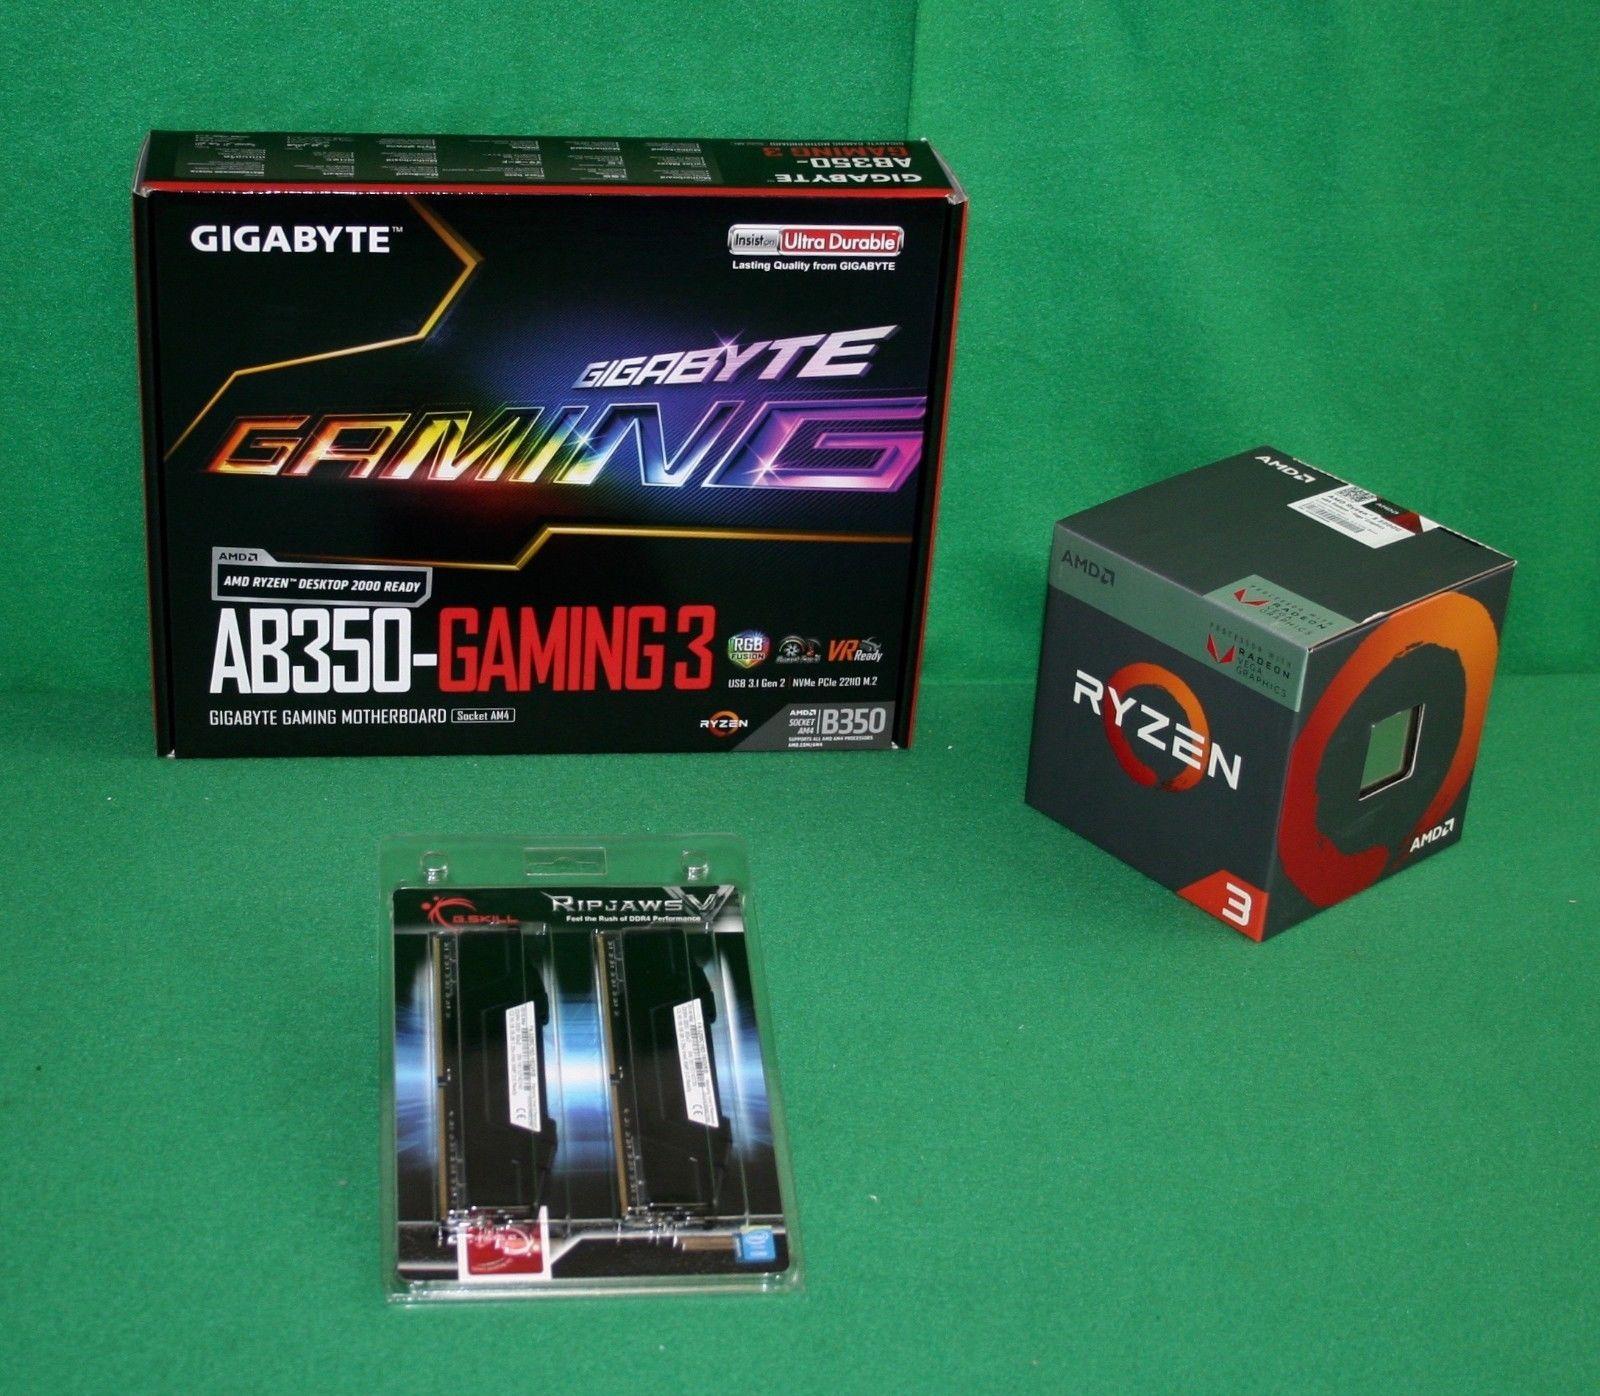 AMD Ryzen 3 2200G & Gigabyte AB350 Gaming 3 MB & 16GB RipJaws RAM Builder bo